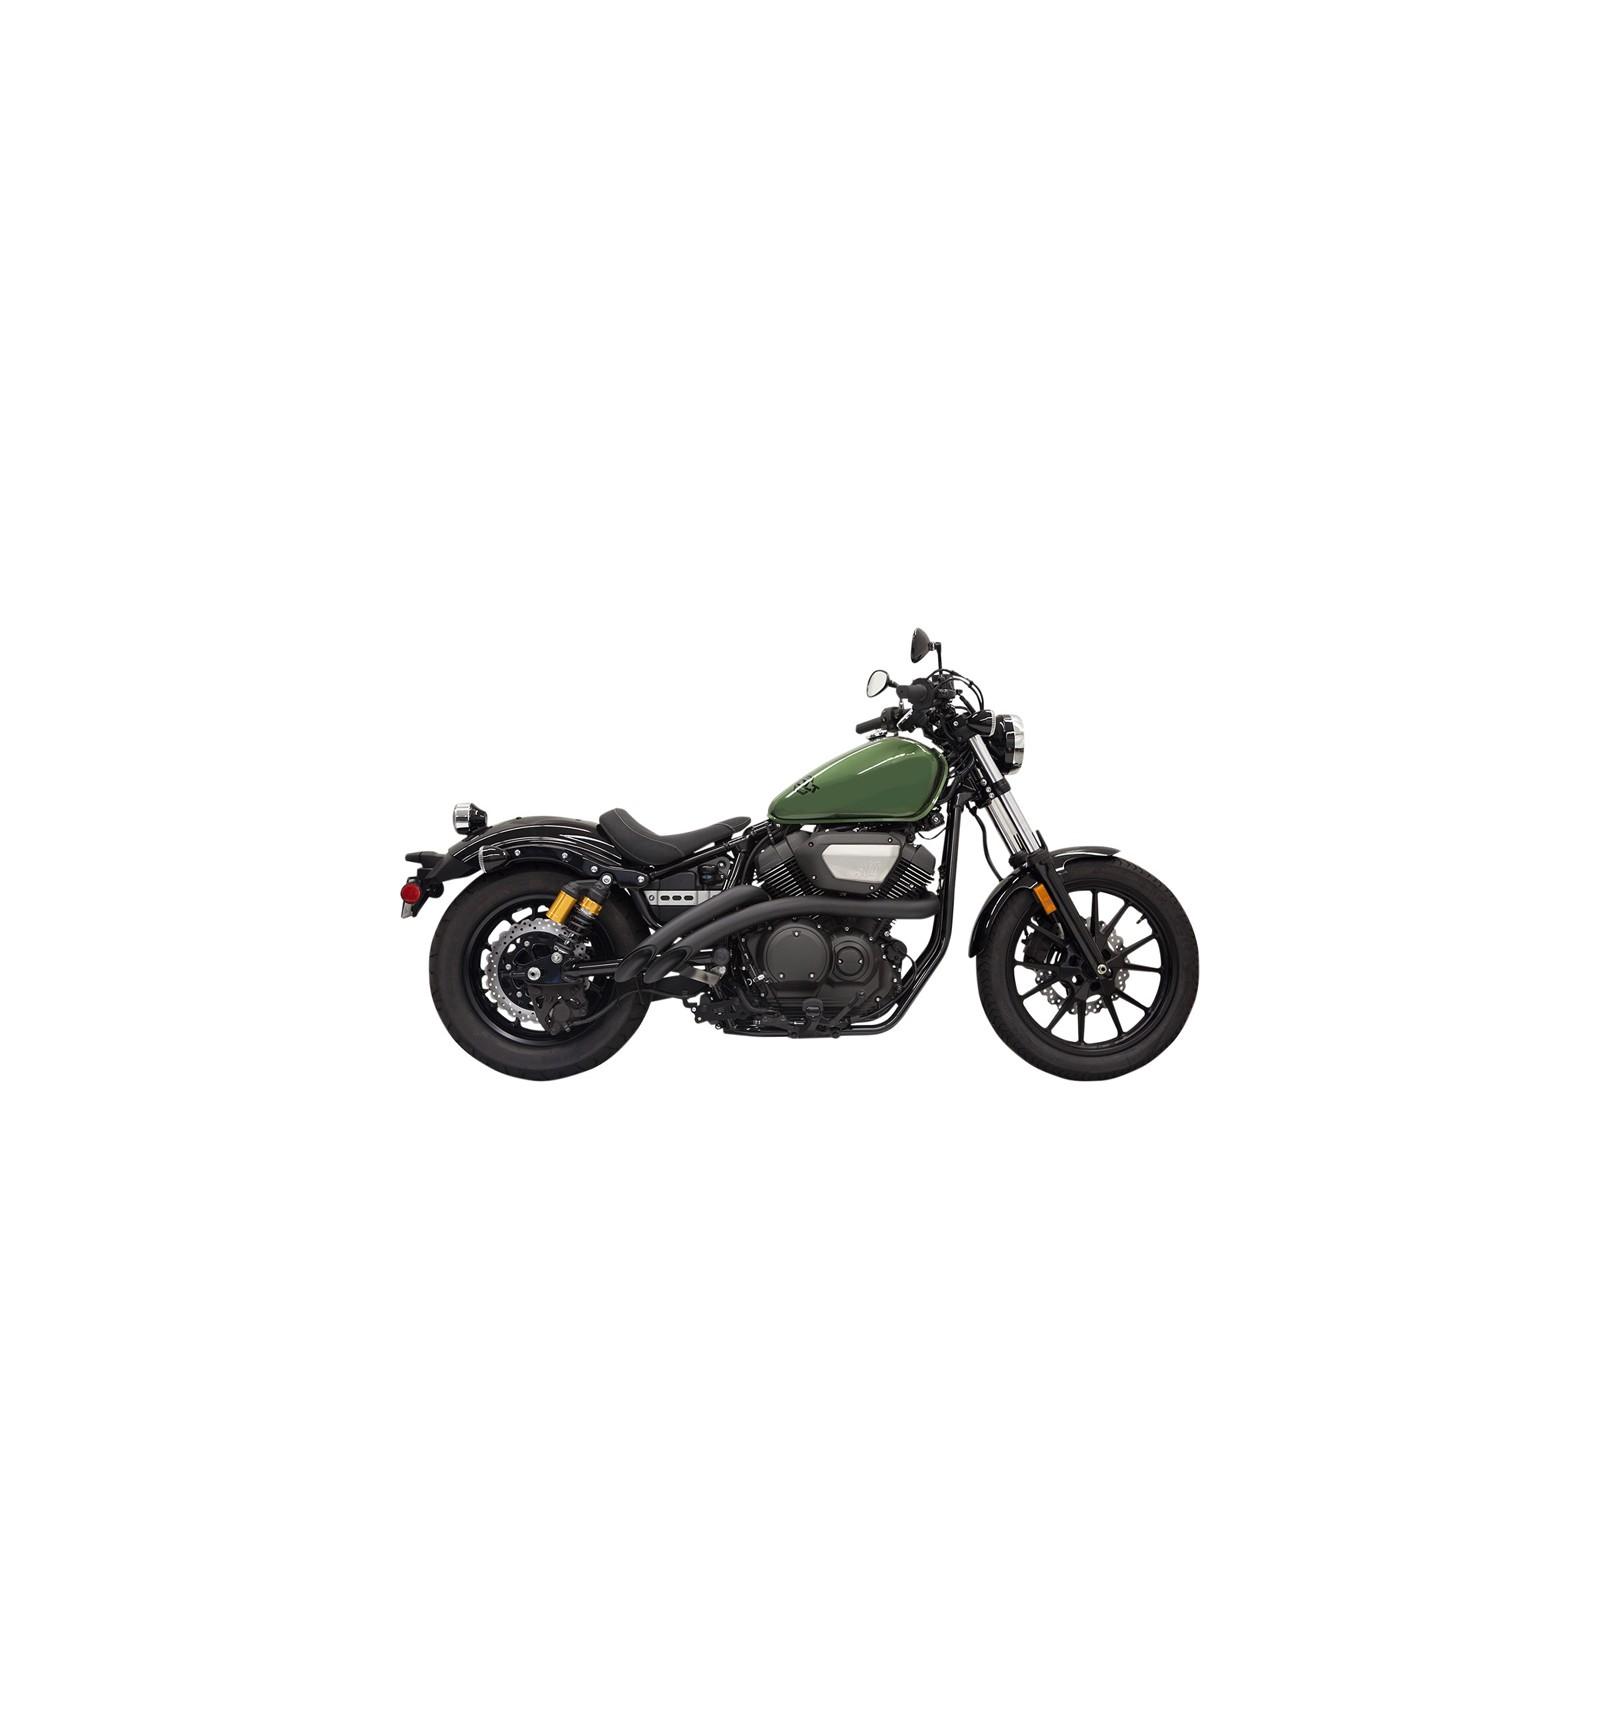 yamaha xv950 r bolt racer bassani xhaust exhaust system radius sweepers black